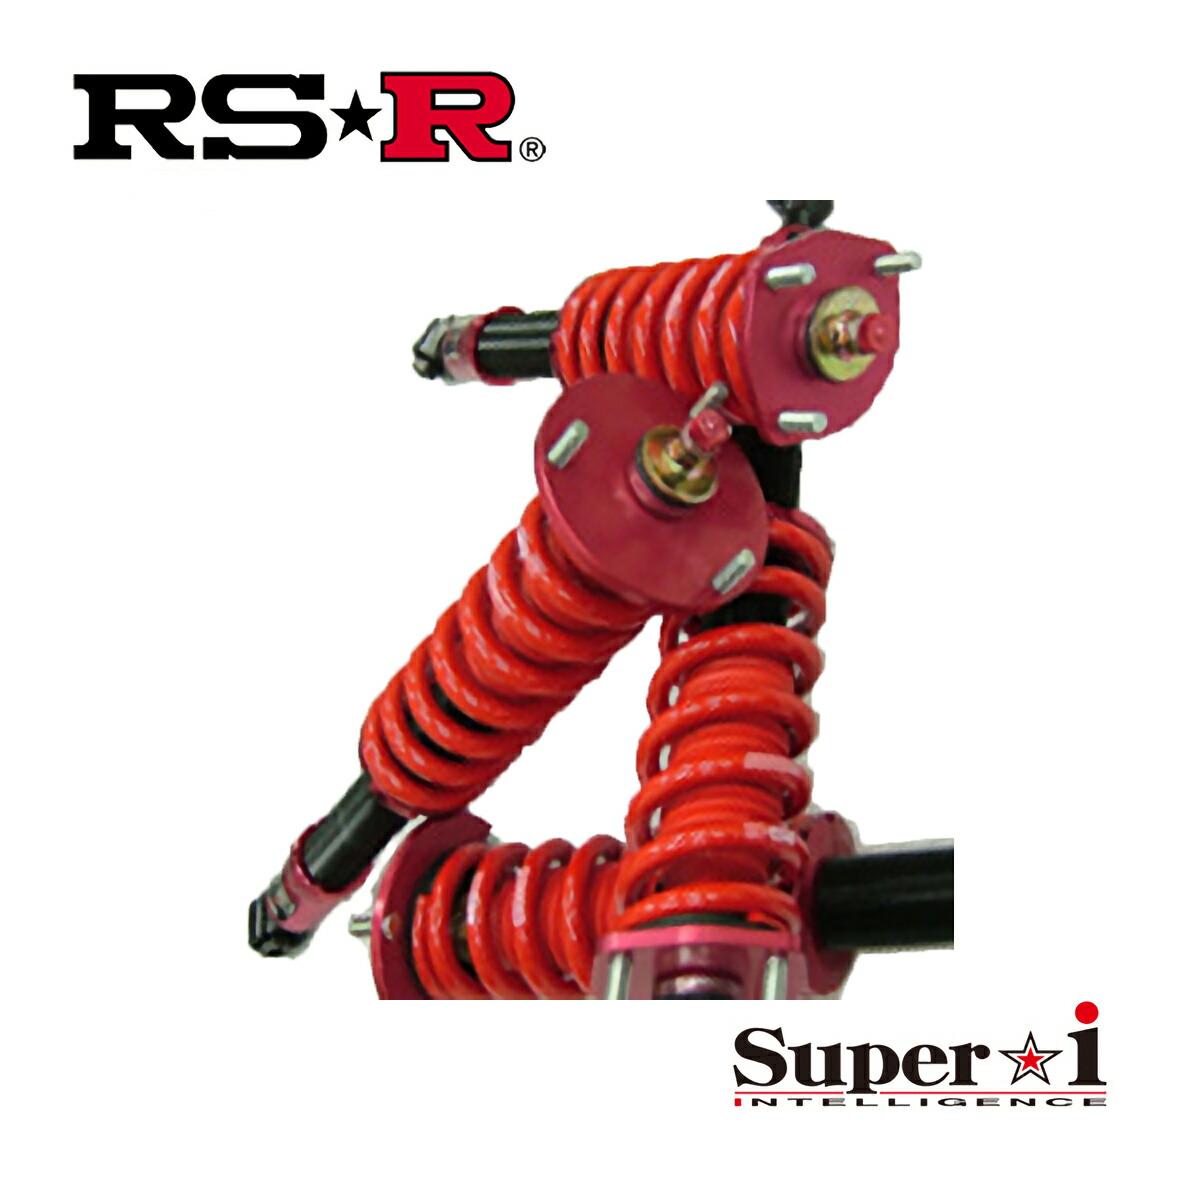 RS-R ヴェルファイアハイブリッド AYH30W ハイブリッド エグゼクティブラウンジ 車高調 リア車高調整:ネジ式 SIT949M スーパーi RSR 個人宅発送追金有